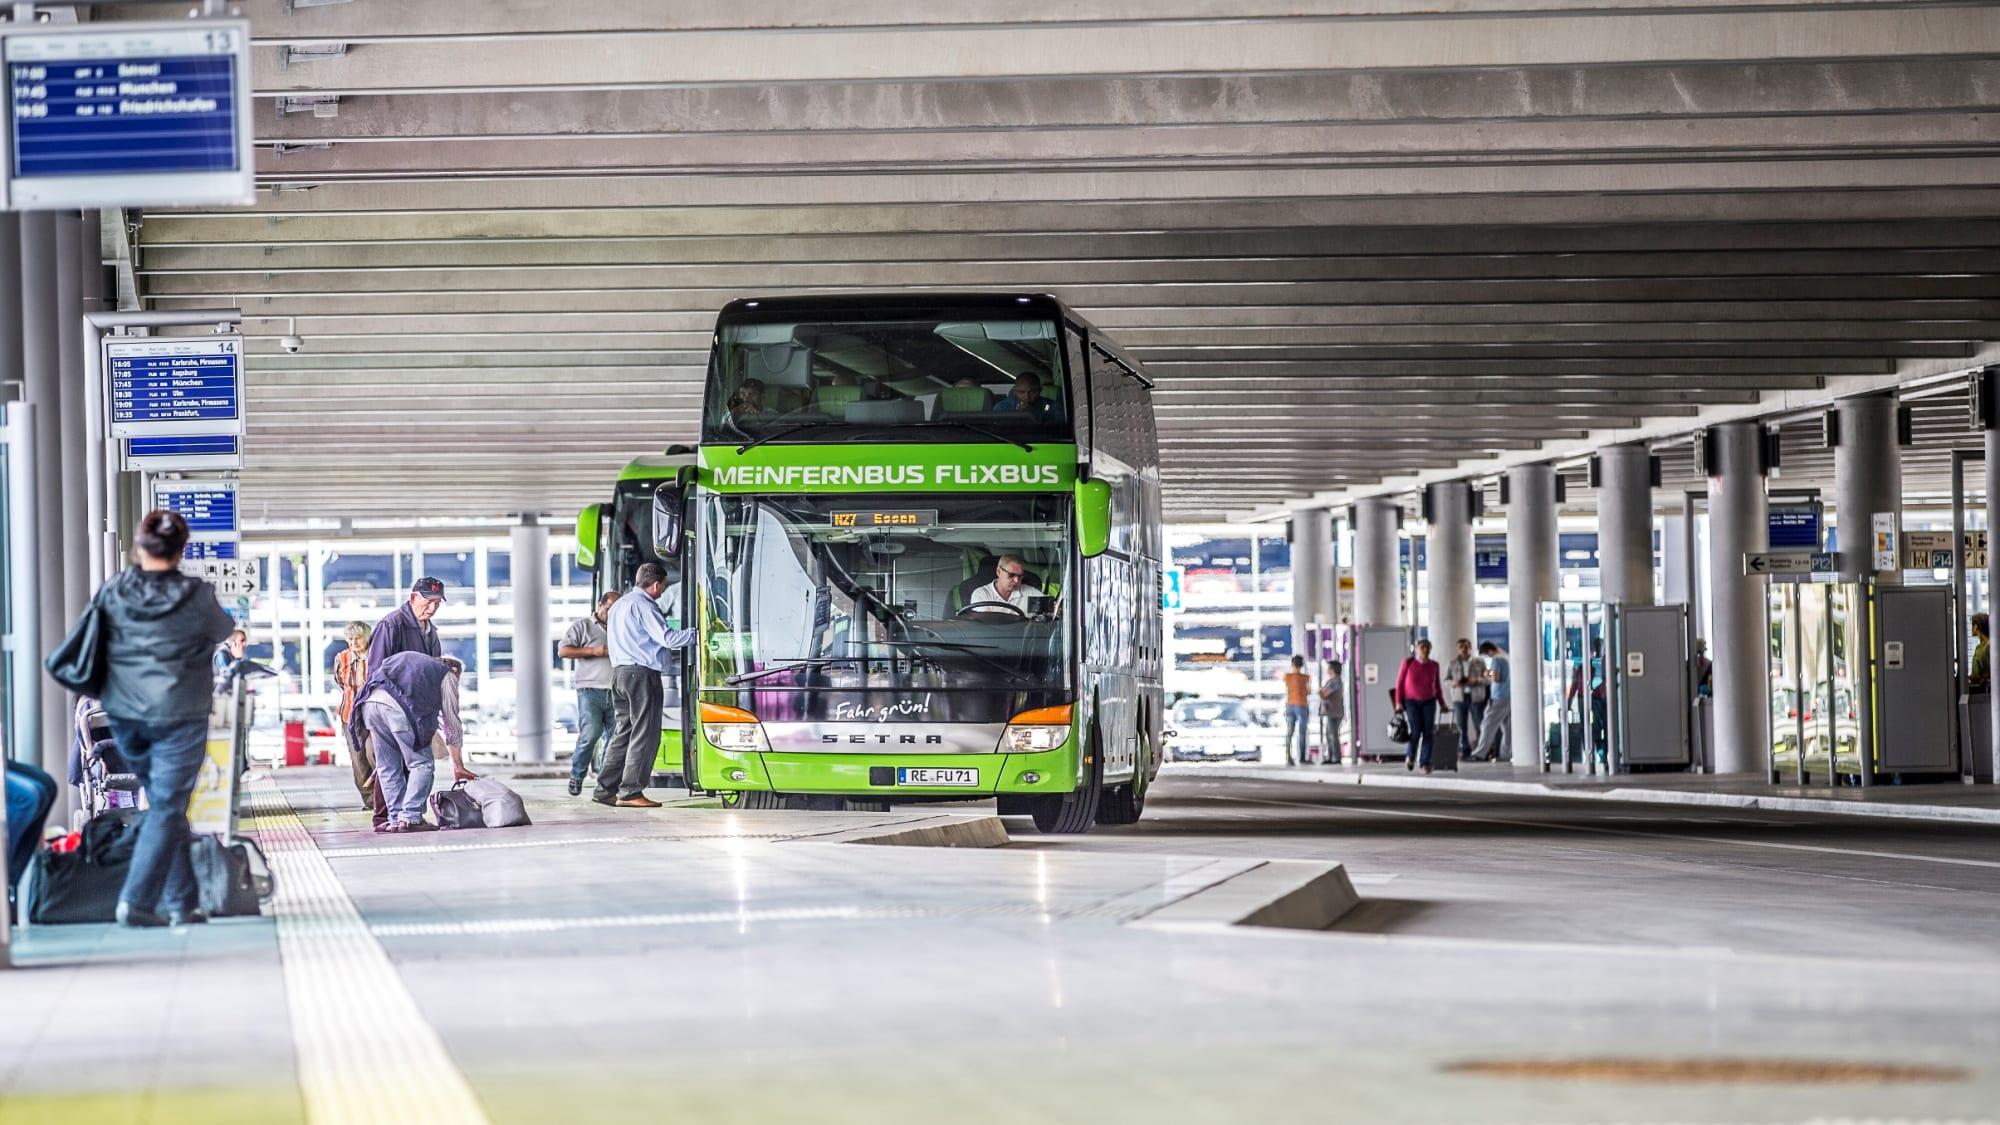 Fernbusbahnhof Stuttgart